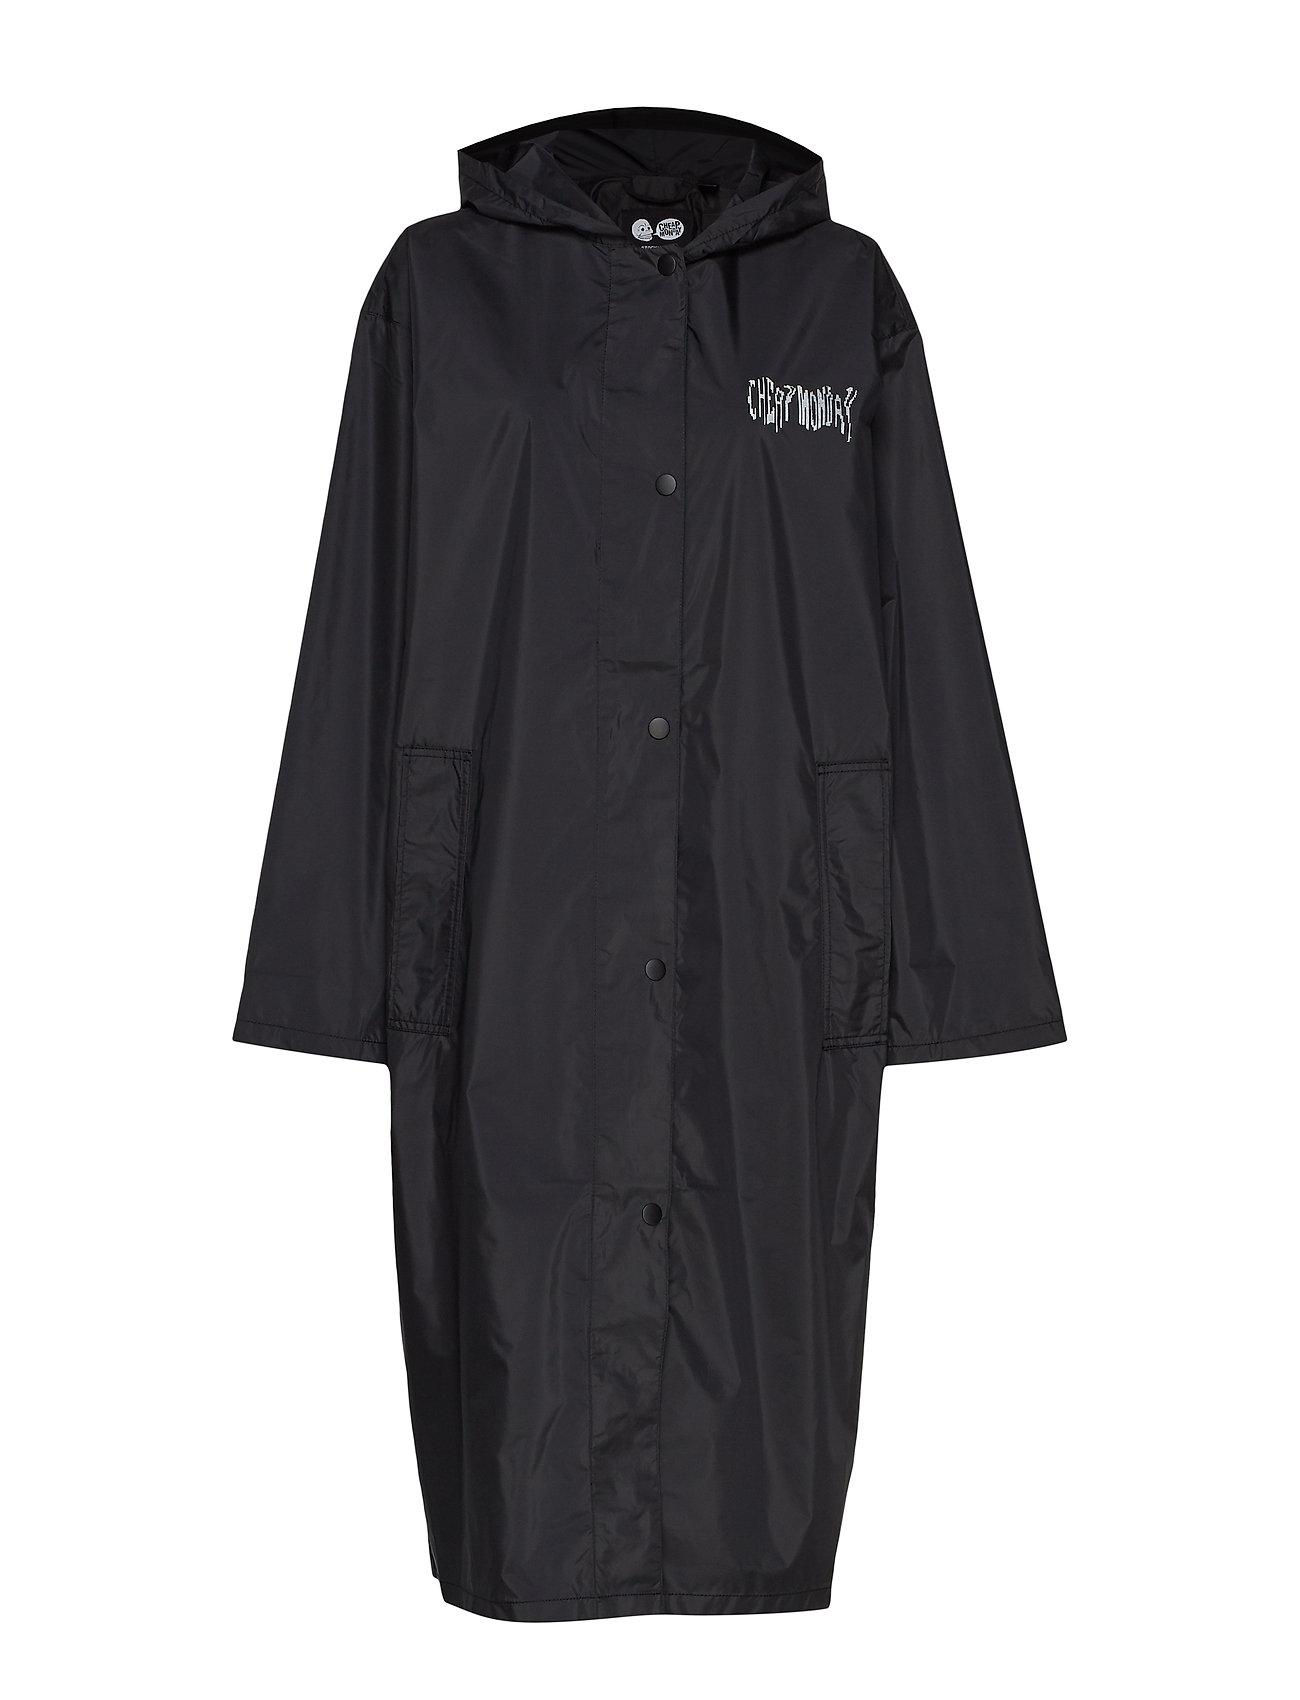 Cheap Monday Option coat Deffect logo